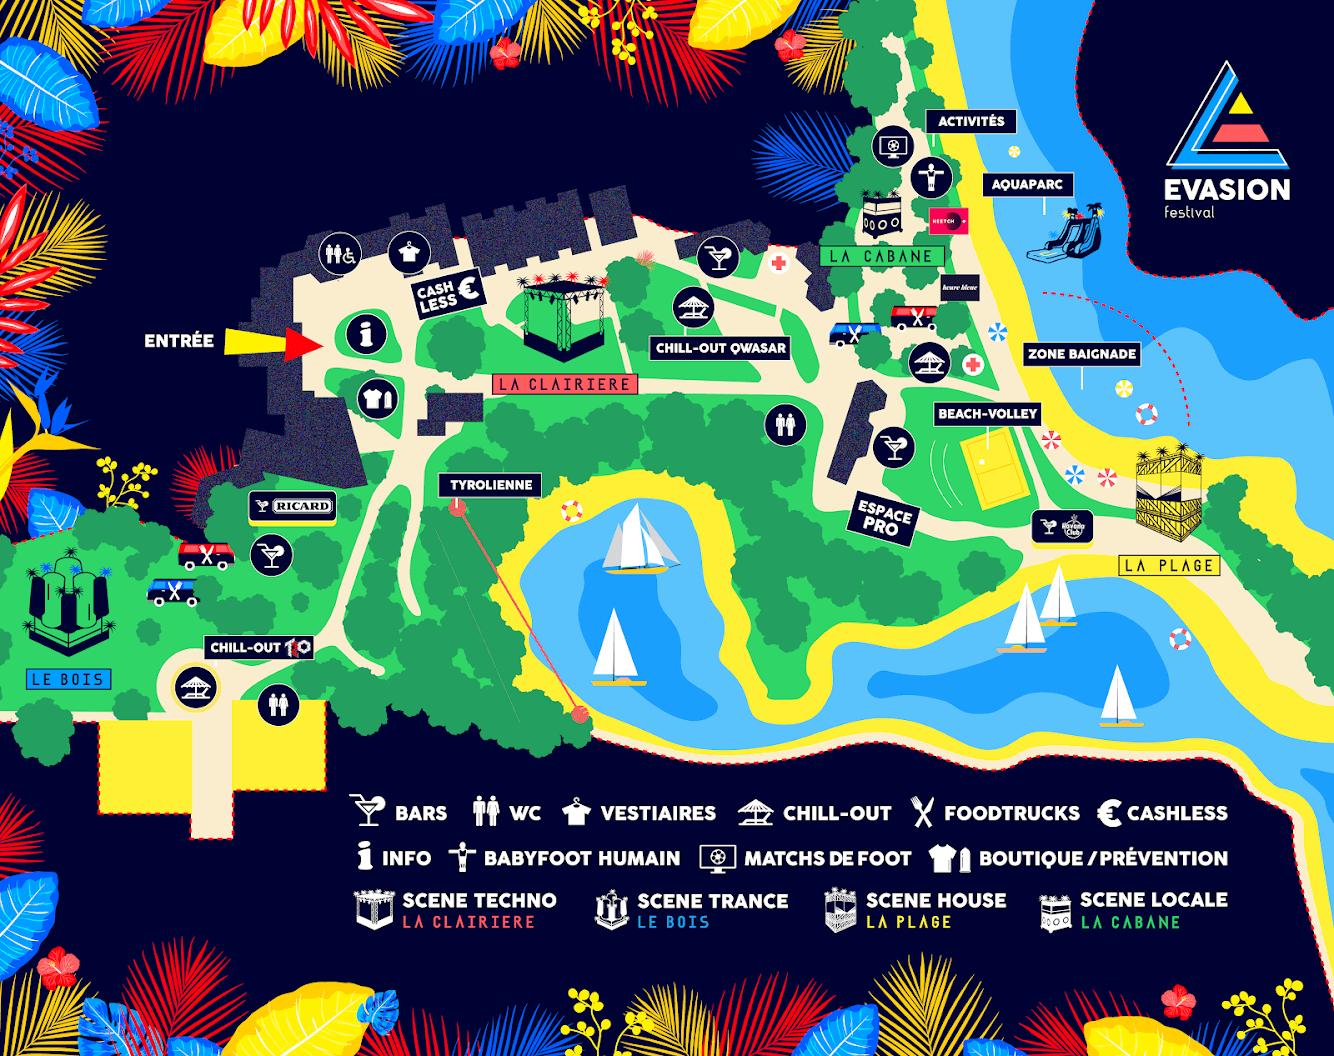 Plan-Evasion-Festival-2018-dure-vie